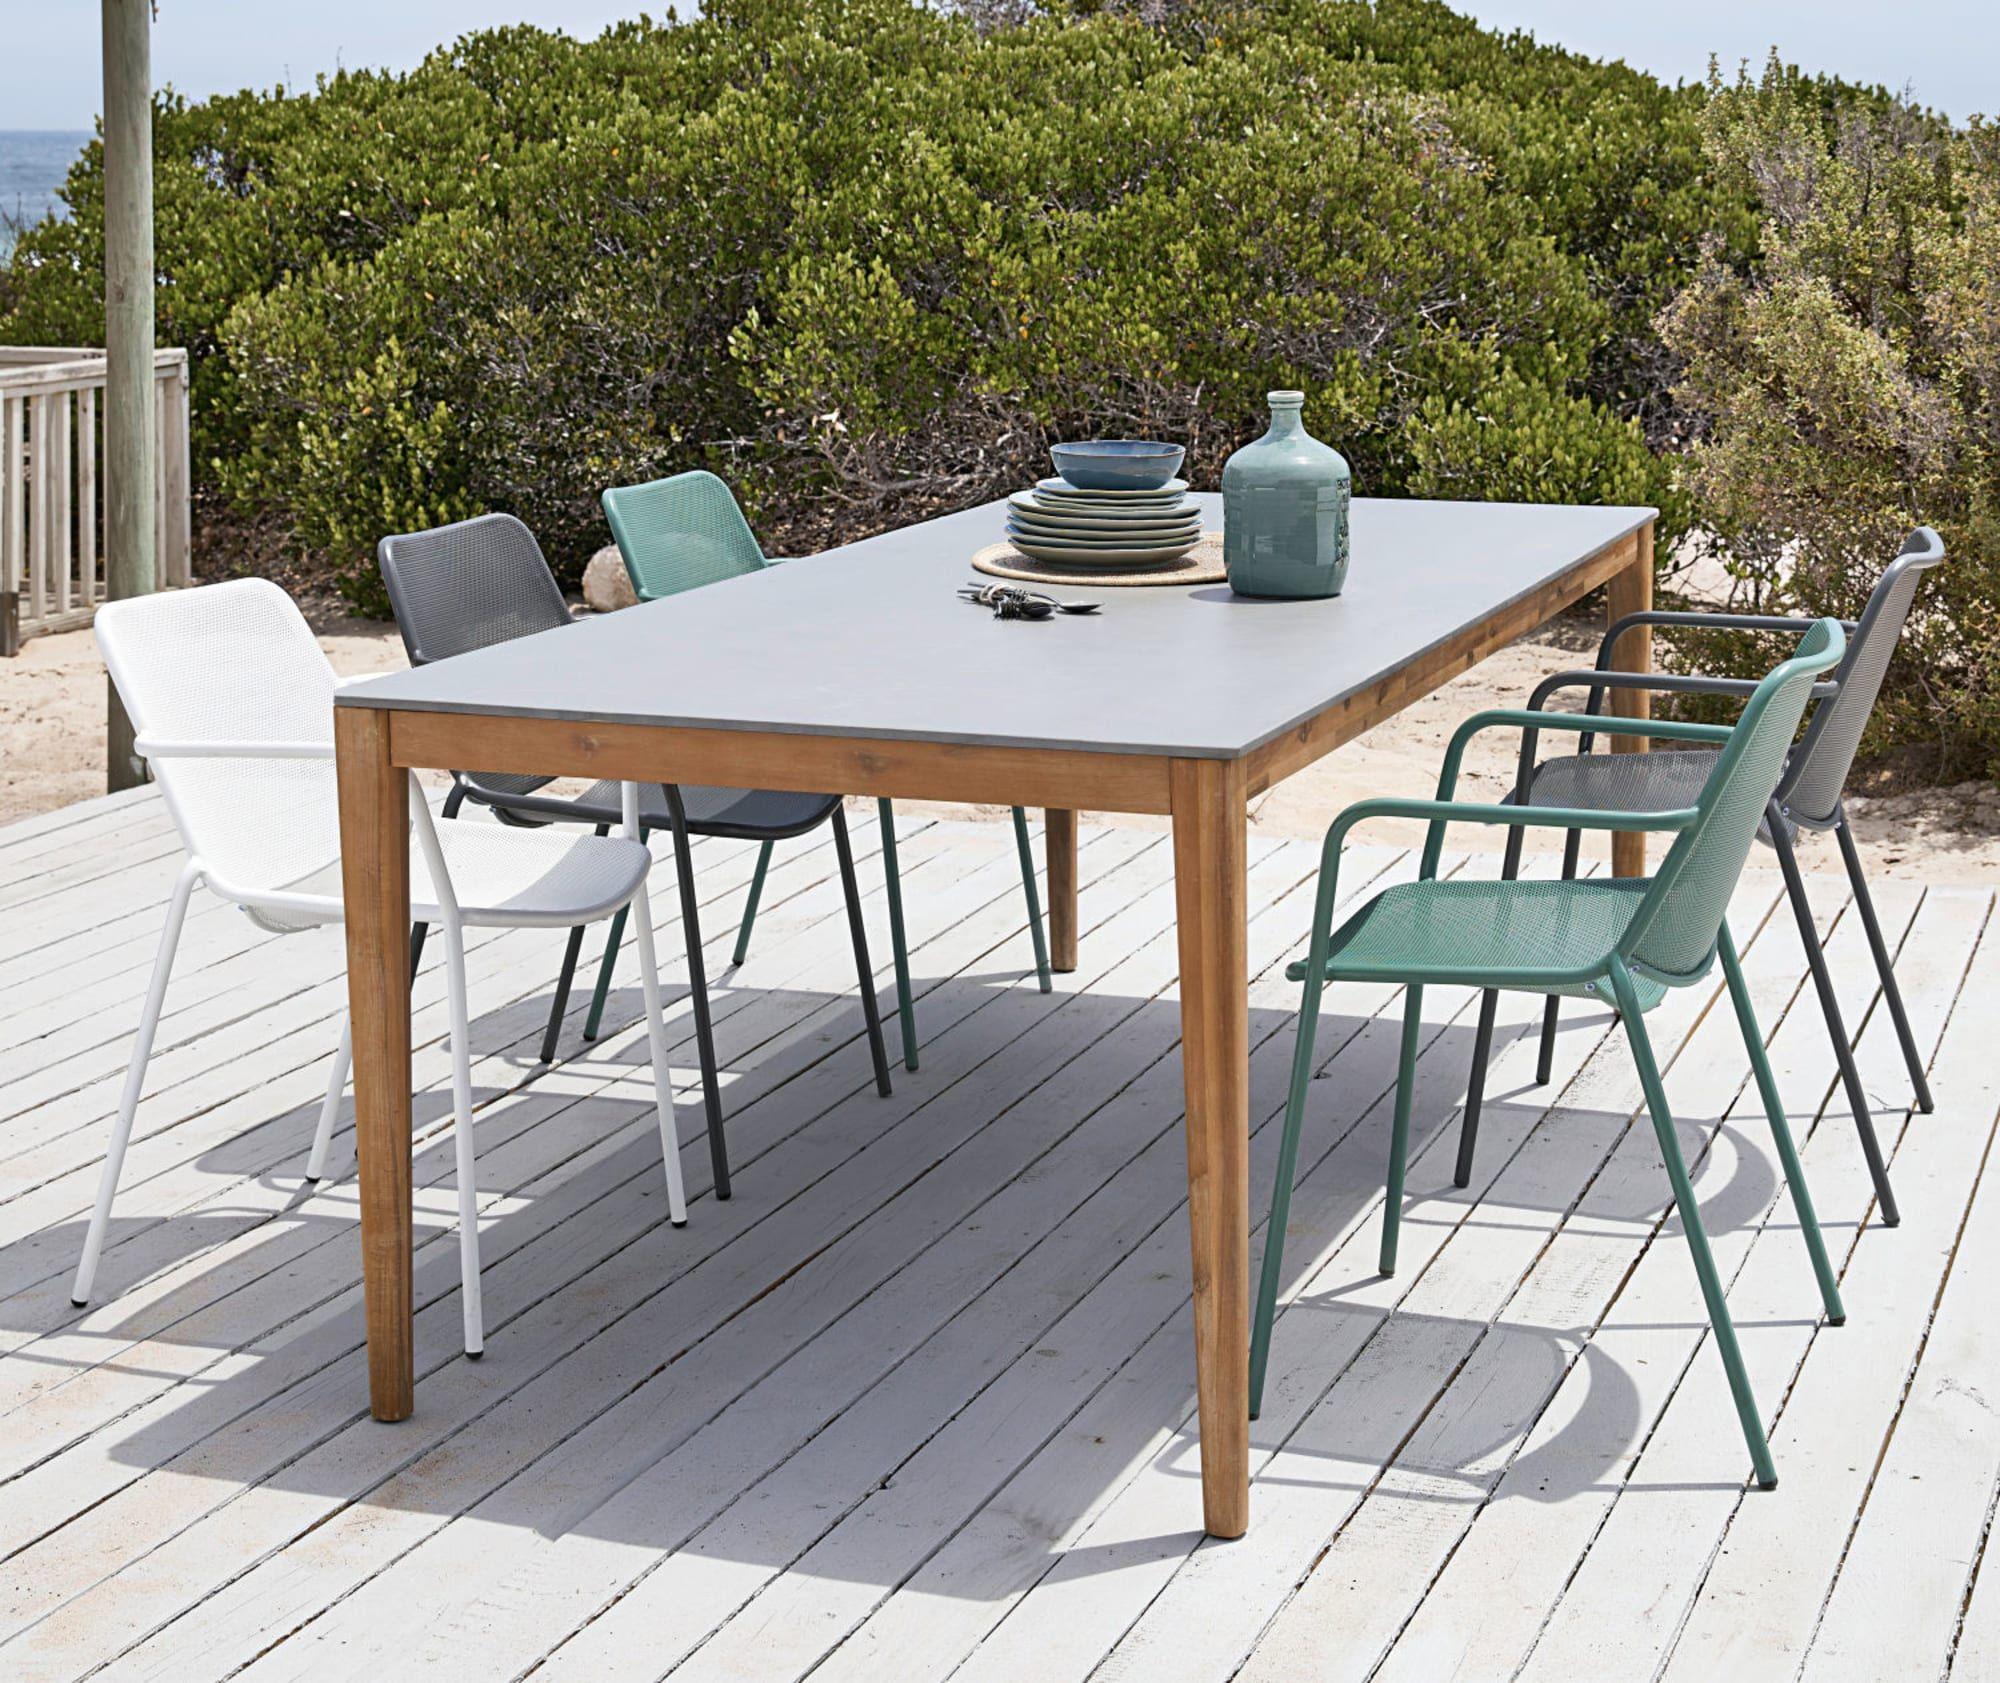 Gartentisch Aus Zement Fur 8 10 Personen L220 Garden Table